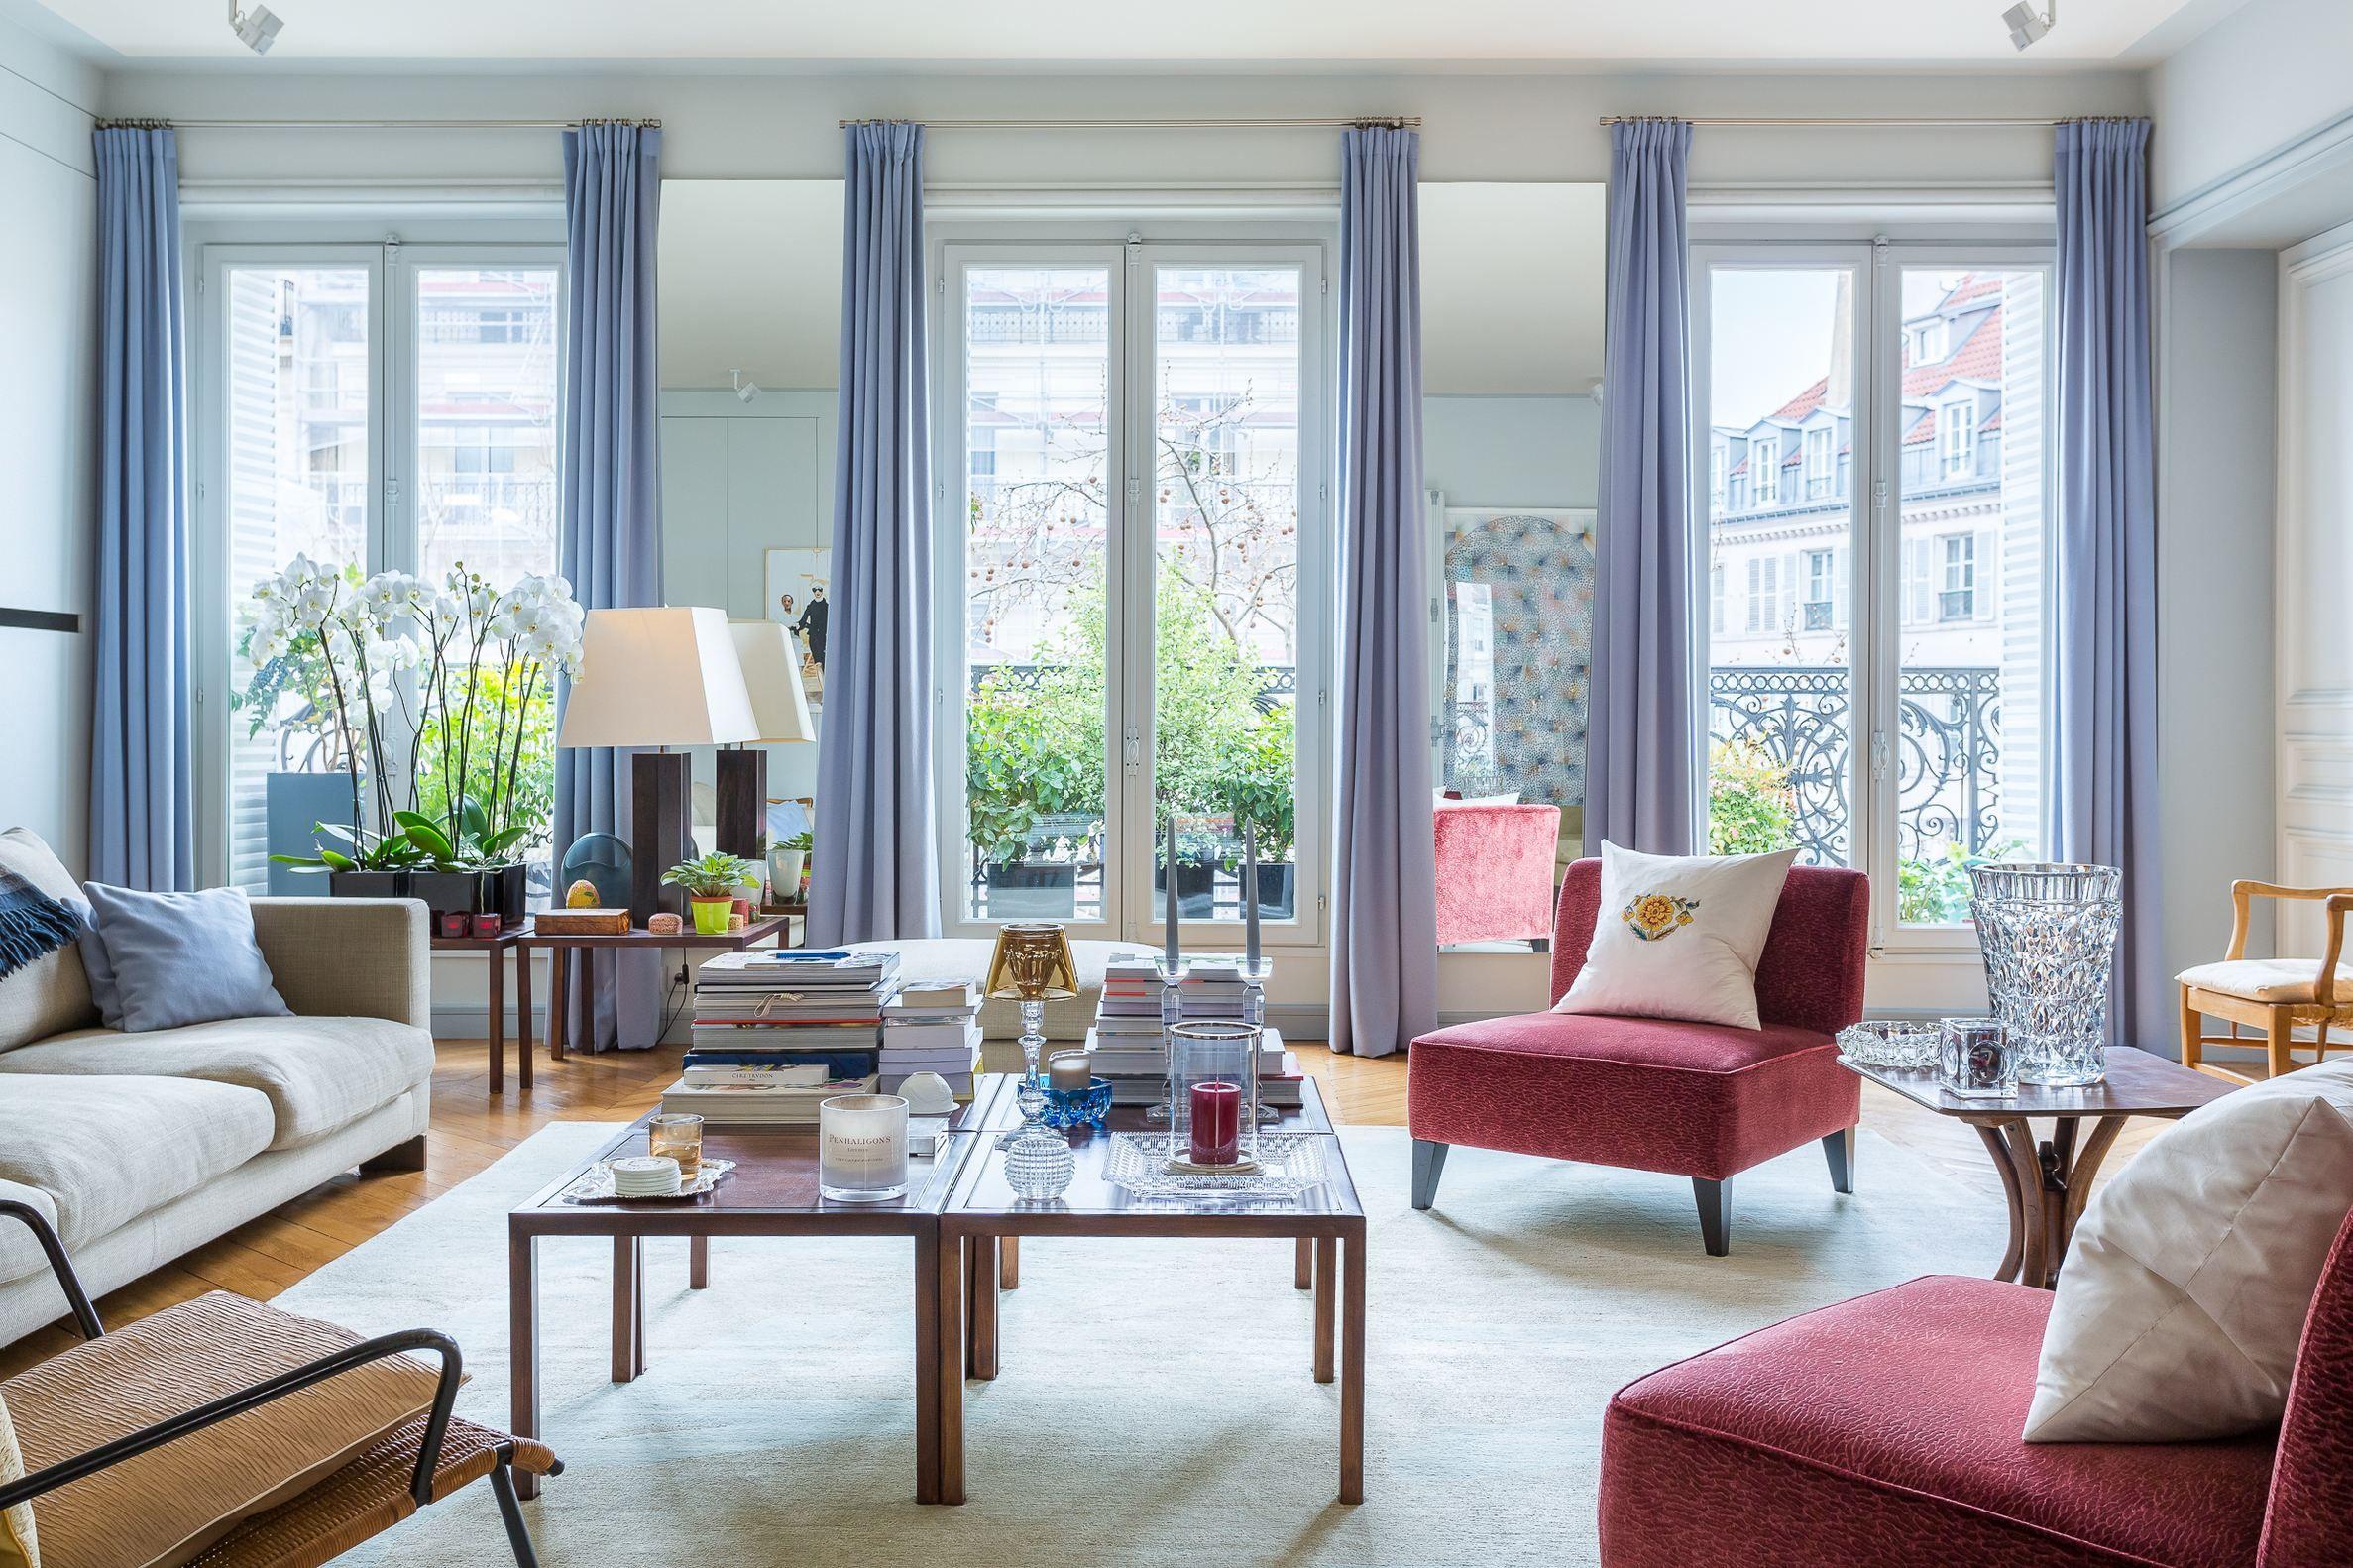 http://www.proprietesparisiennes.com/fr/vente-achat-immobilier-luxe ...